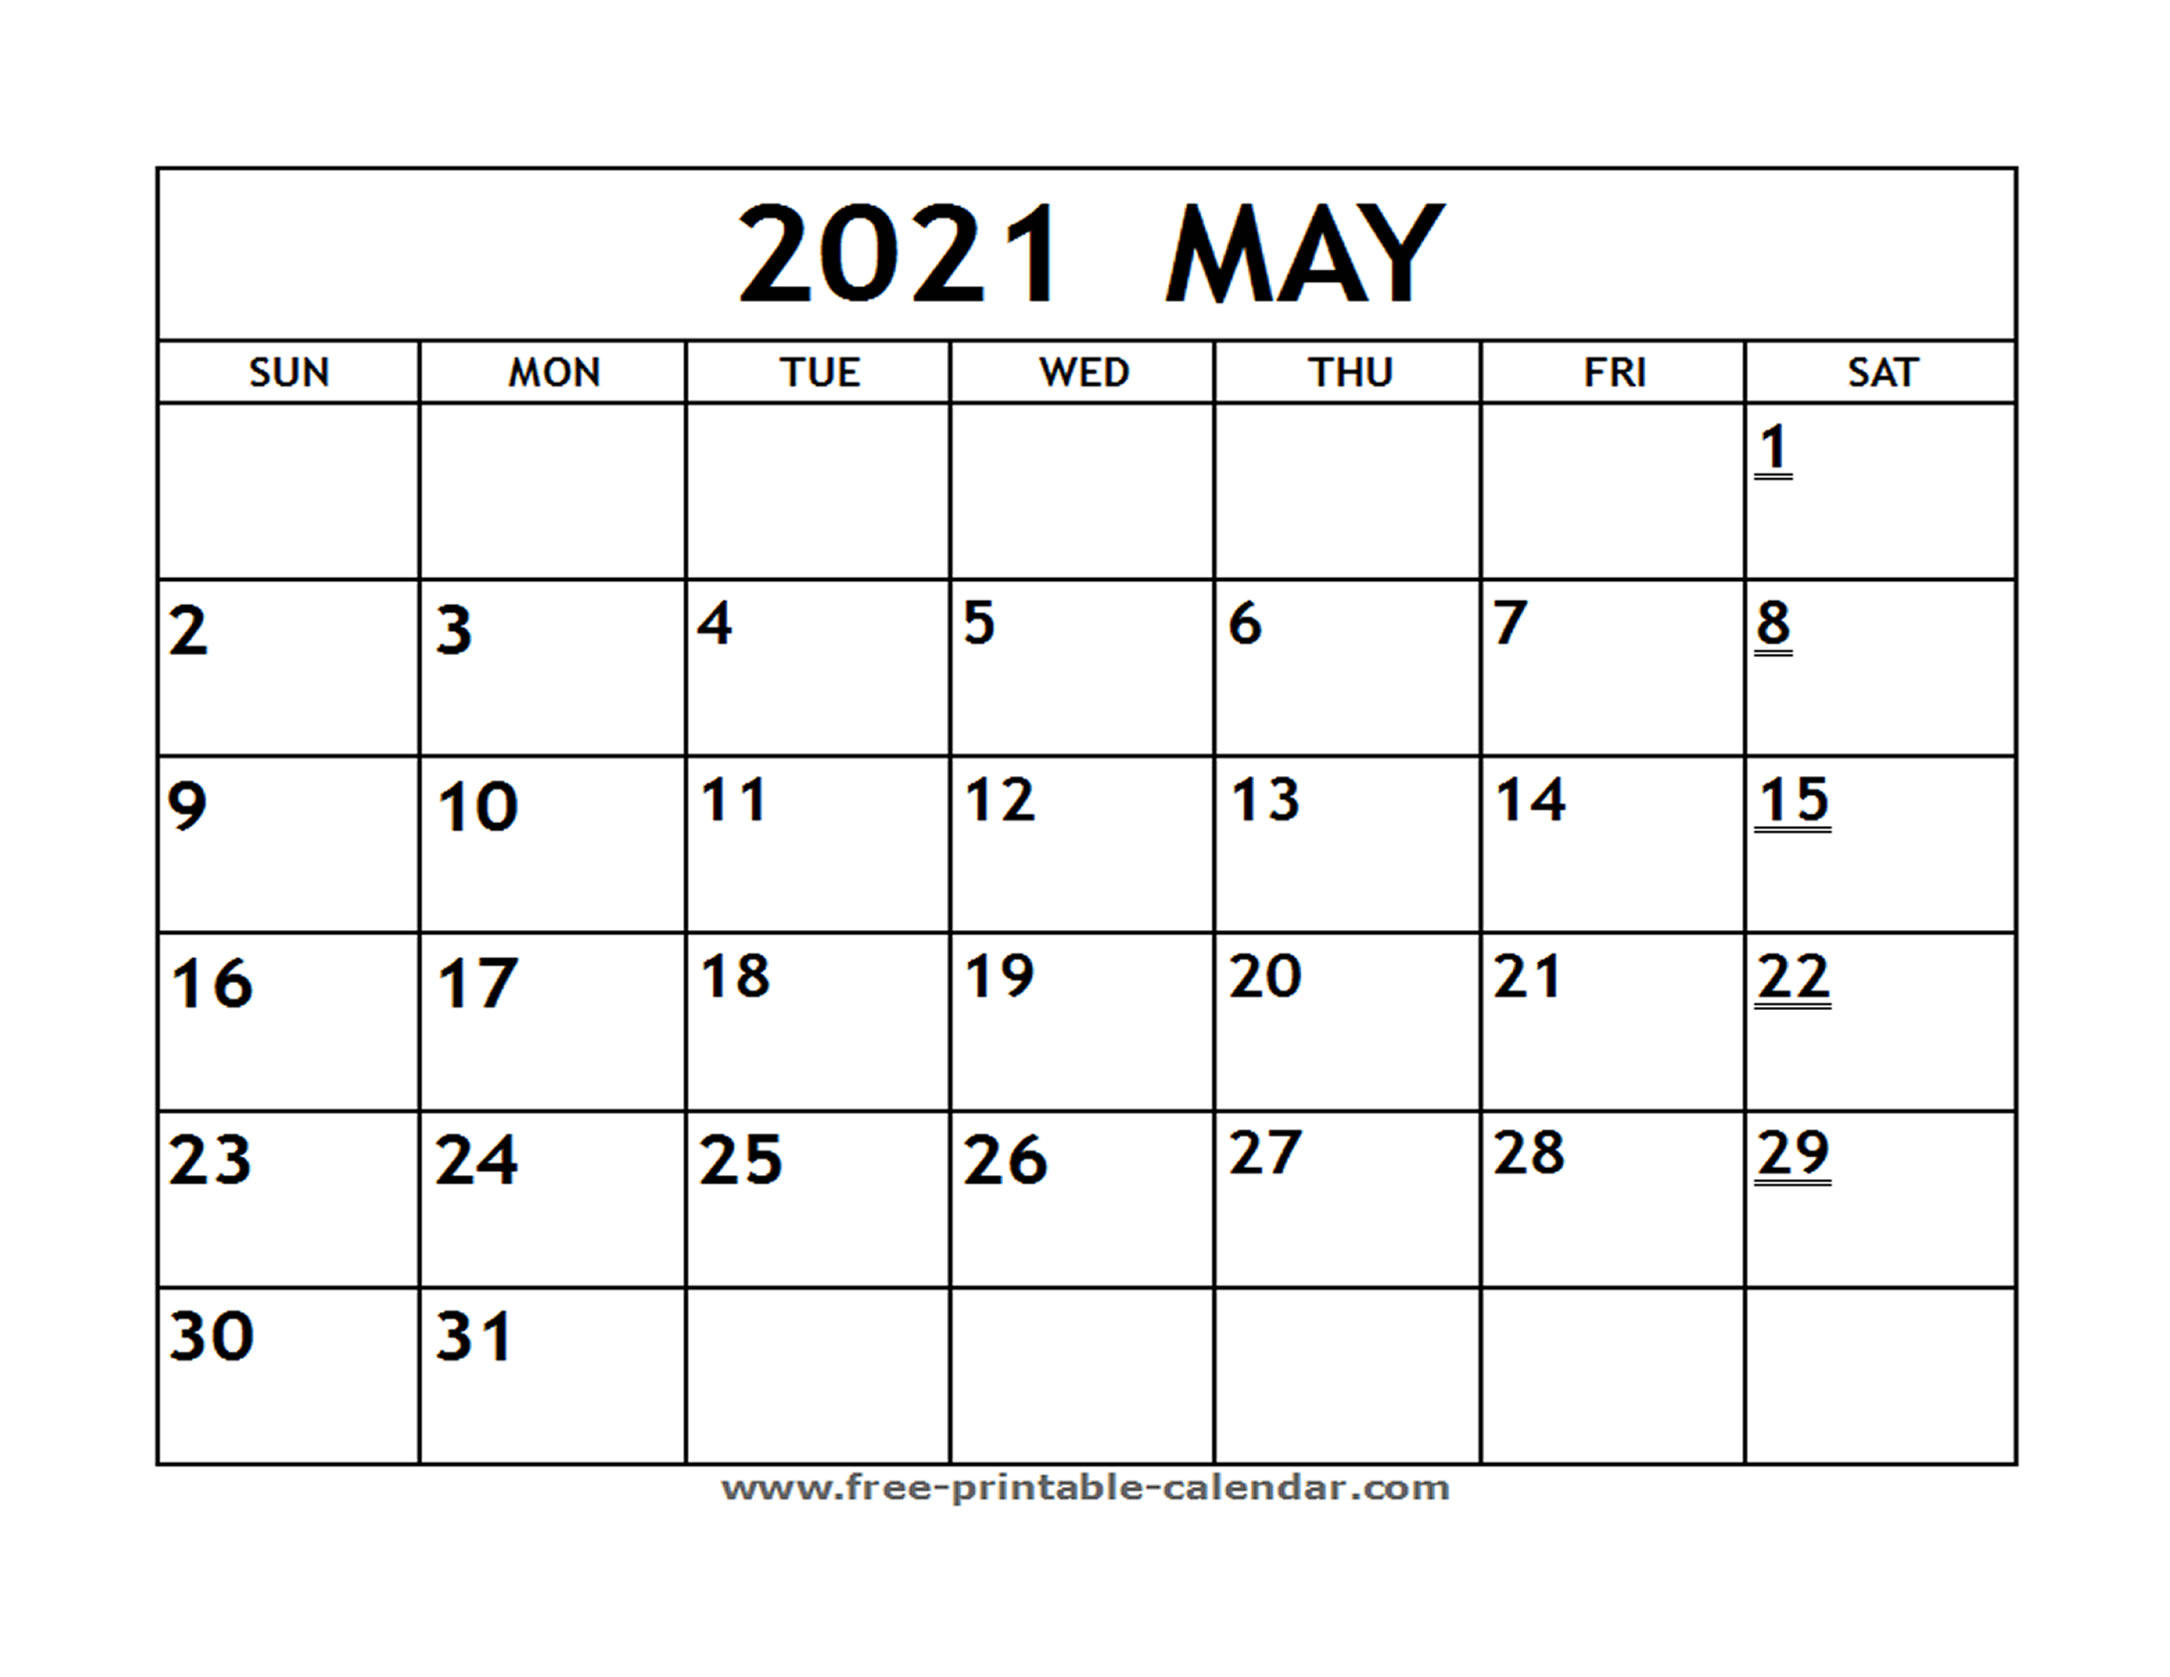 Printable 2021 May Calendar - Free-Printable-Calendar